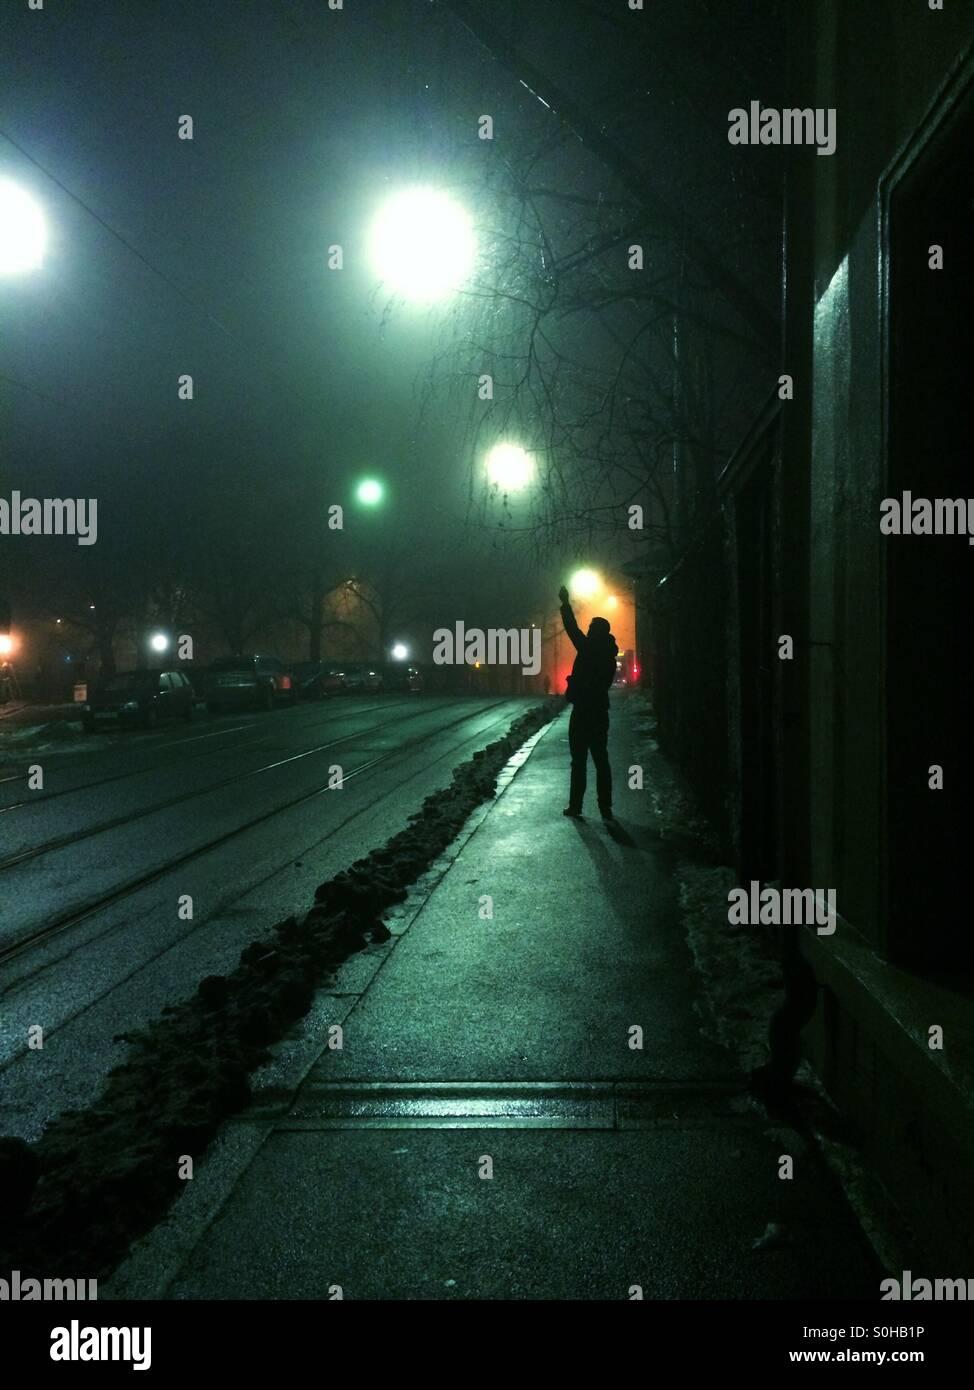 Nuits noires Photo Stock